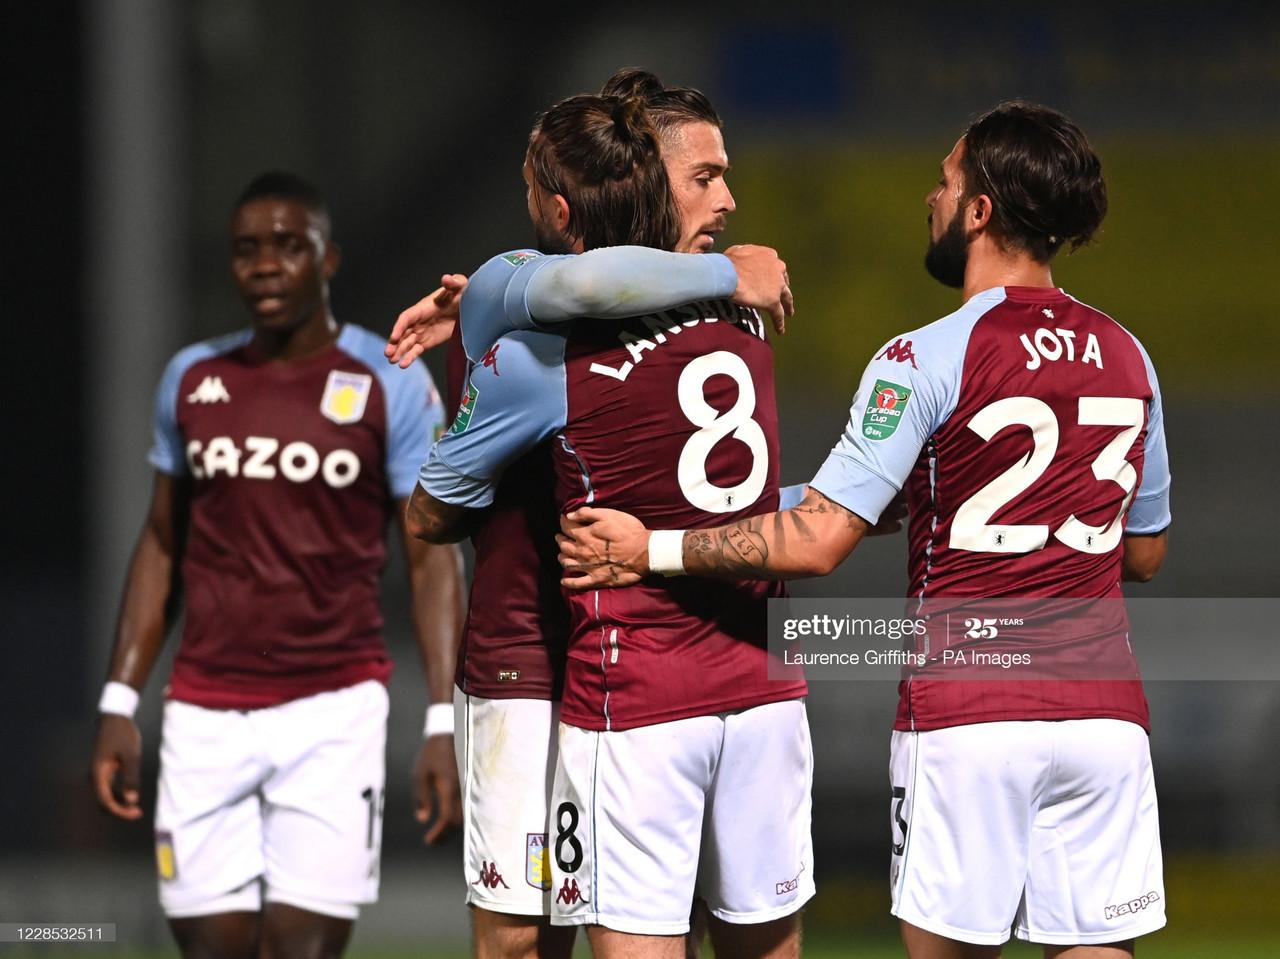 Burton Albion 1-3 Aston Villa: Grealish the star as Villains progress in EFL Cup